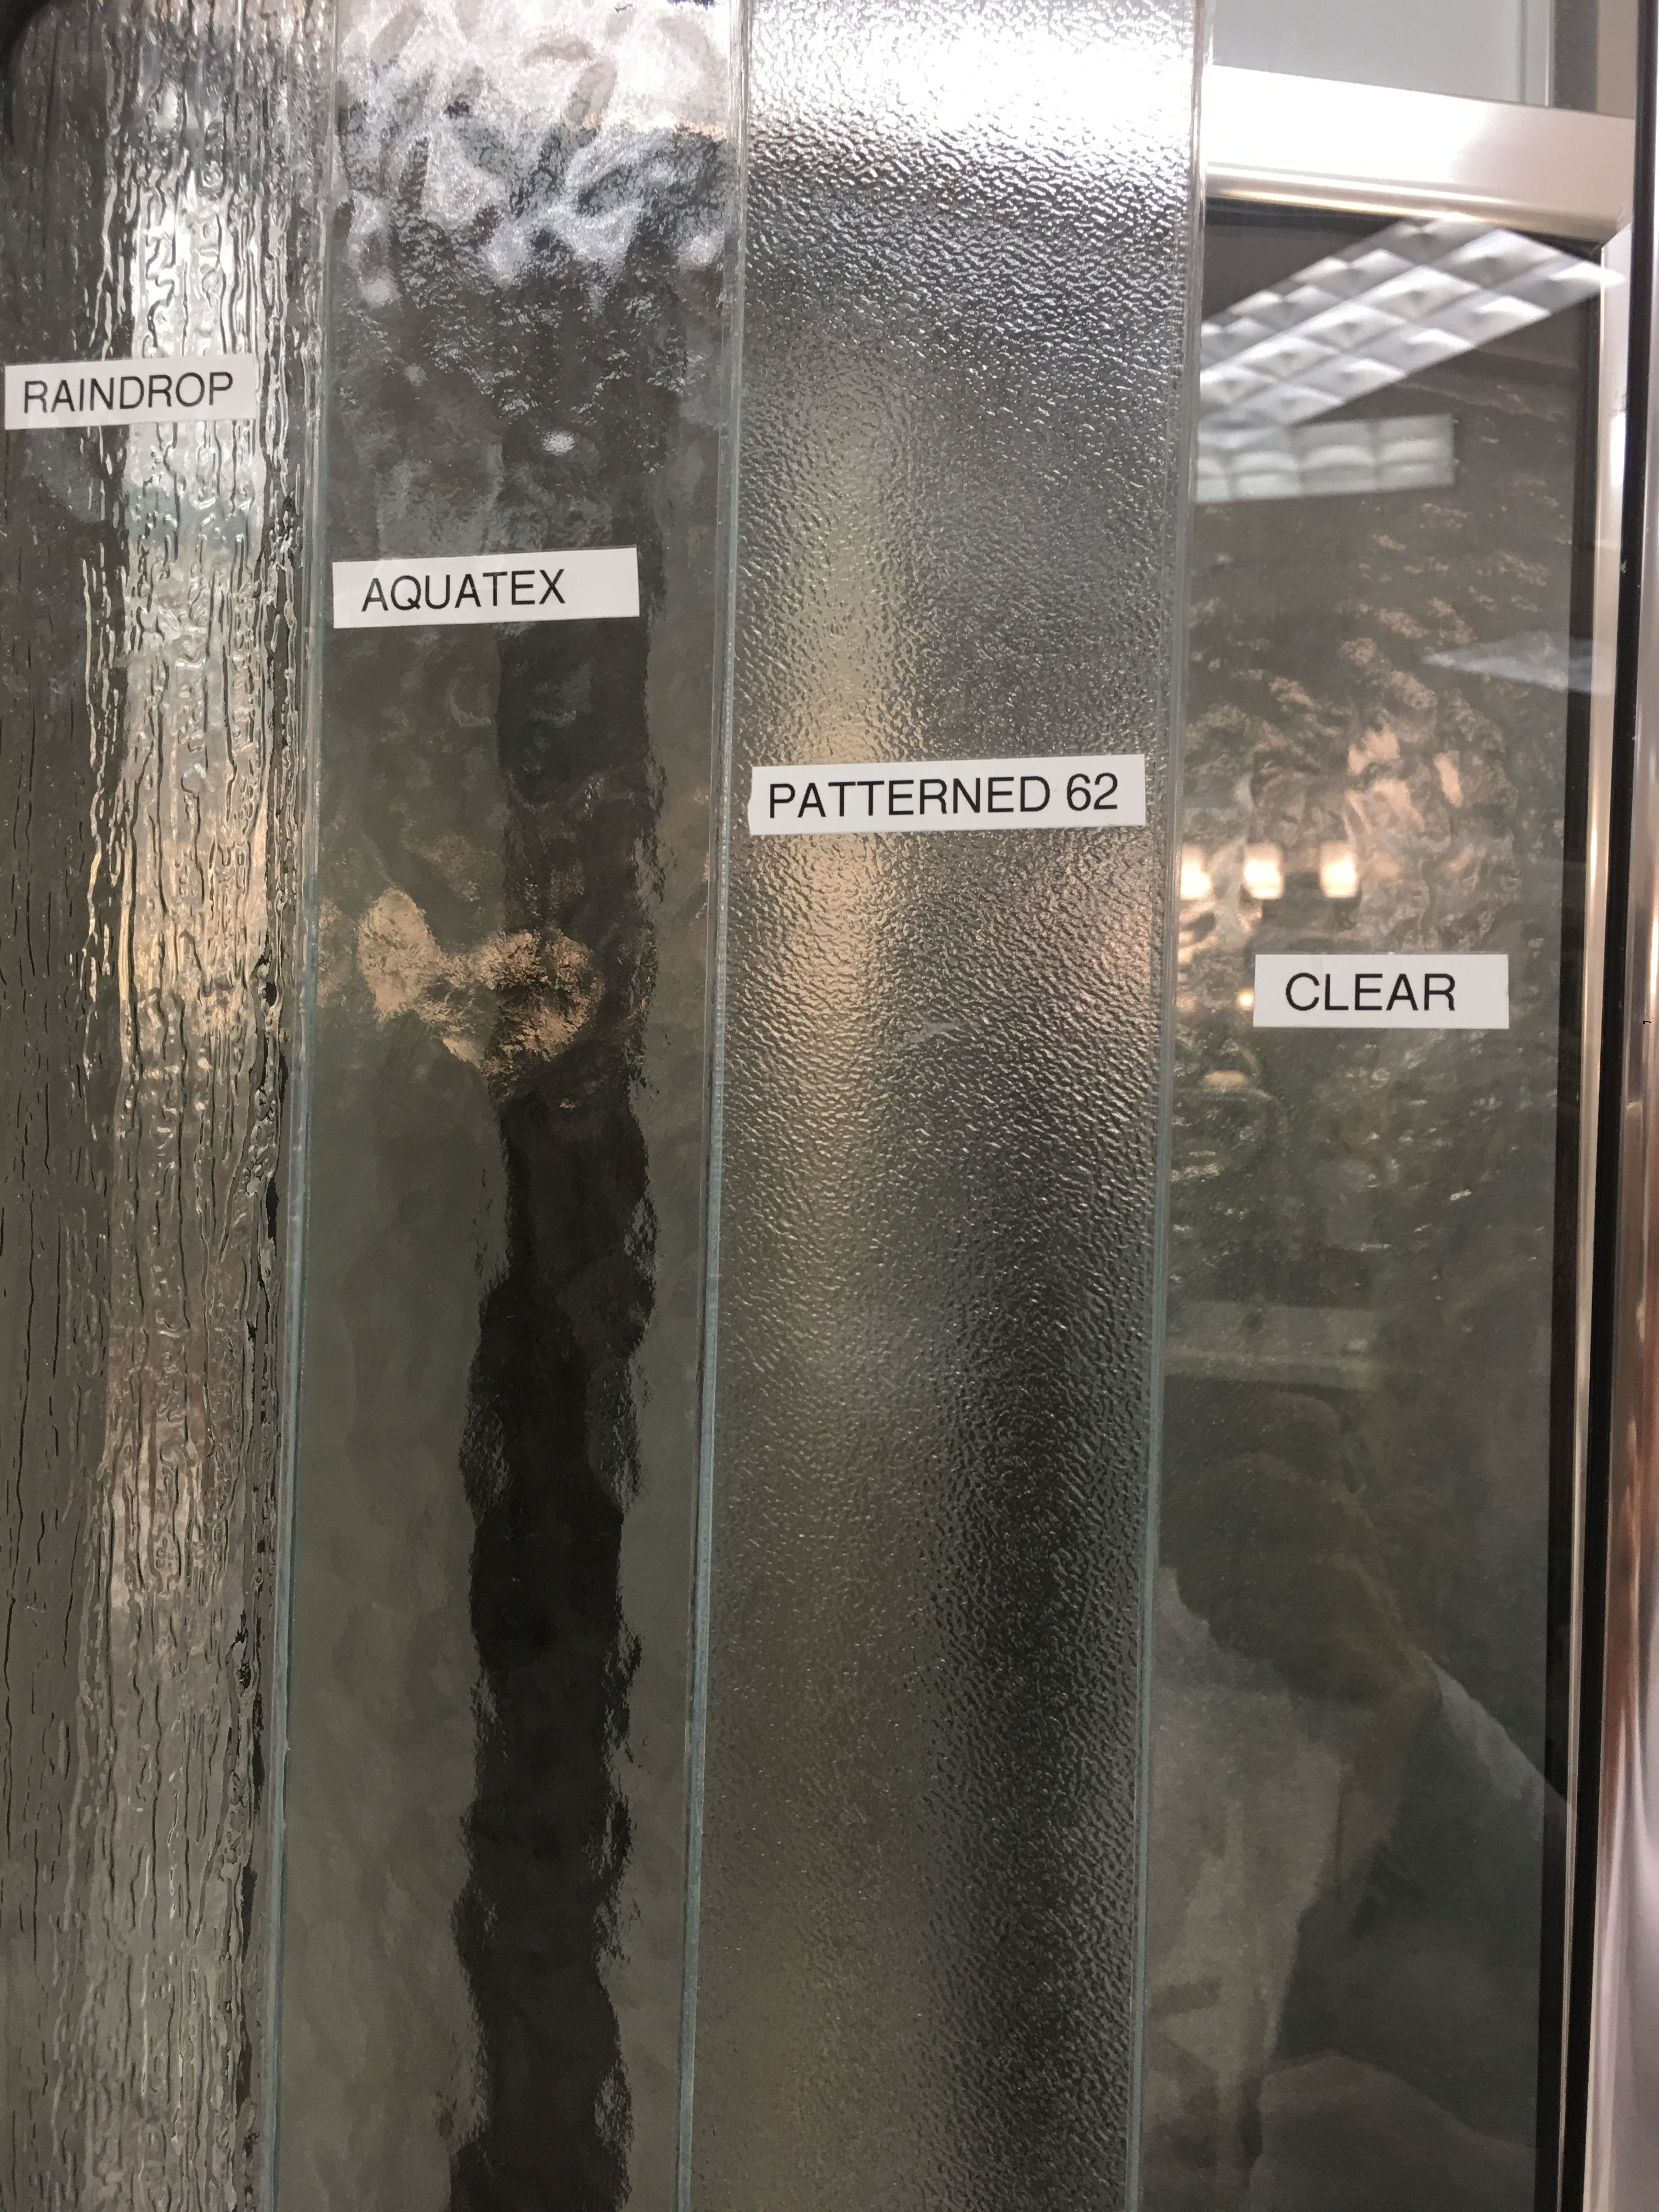 Standard Shower Glass Patterns Glass Shower Pattern Glass